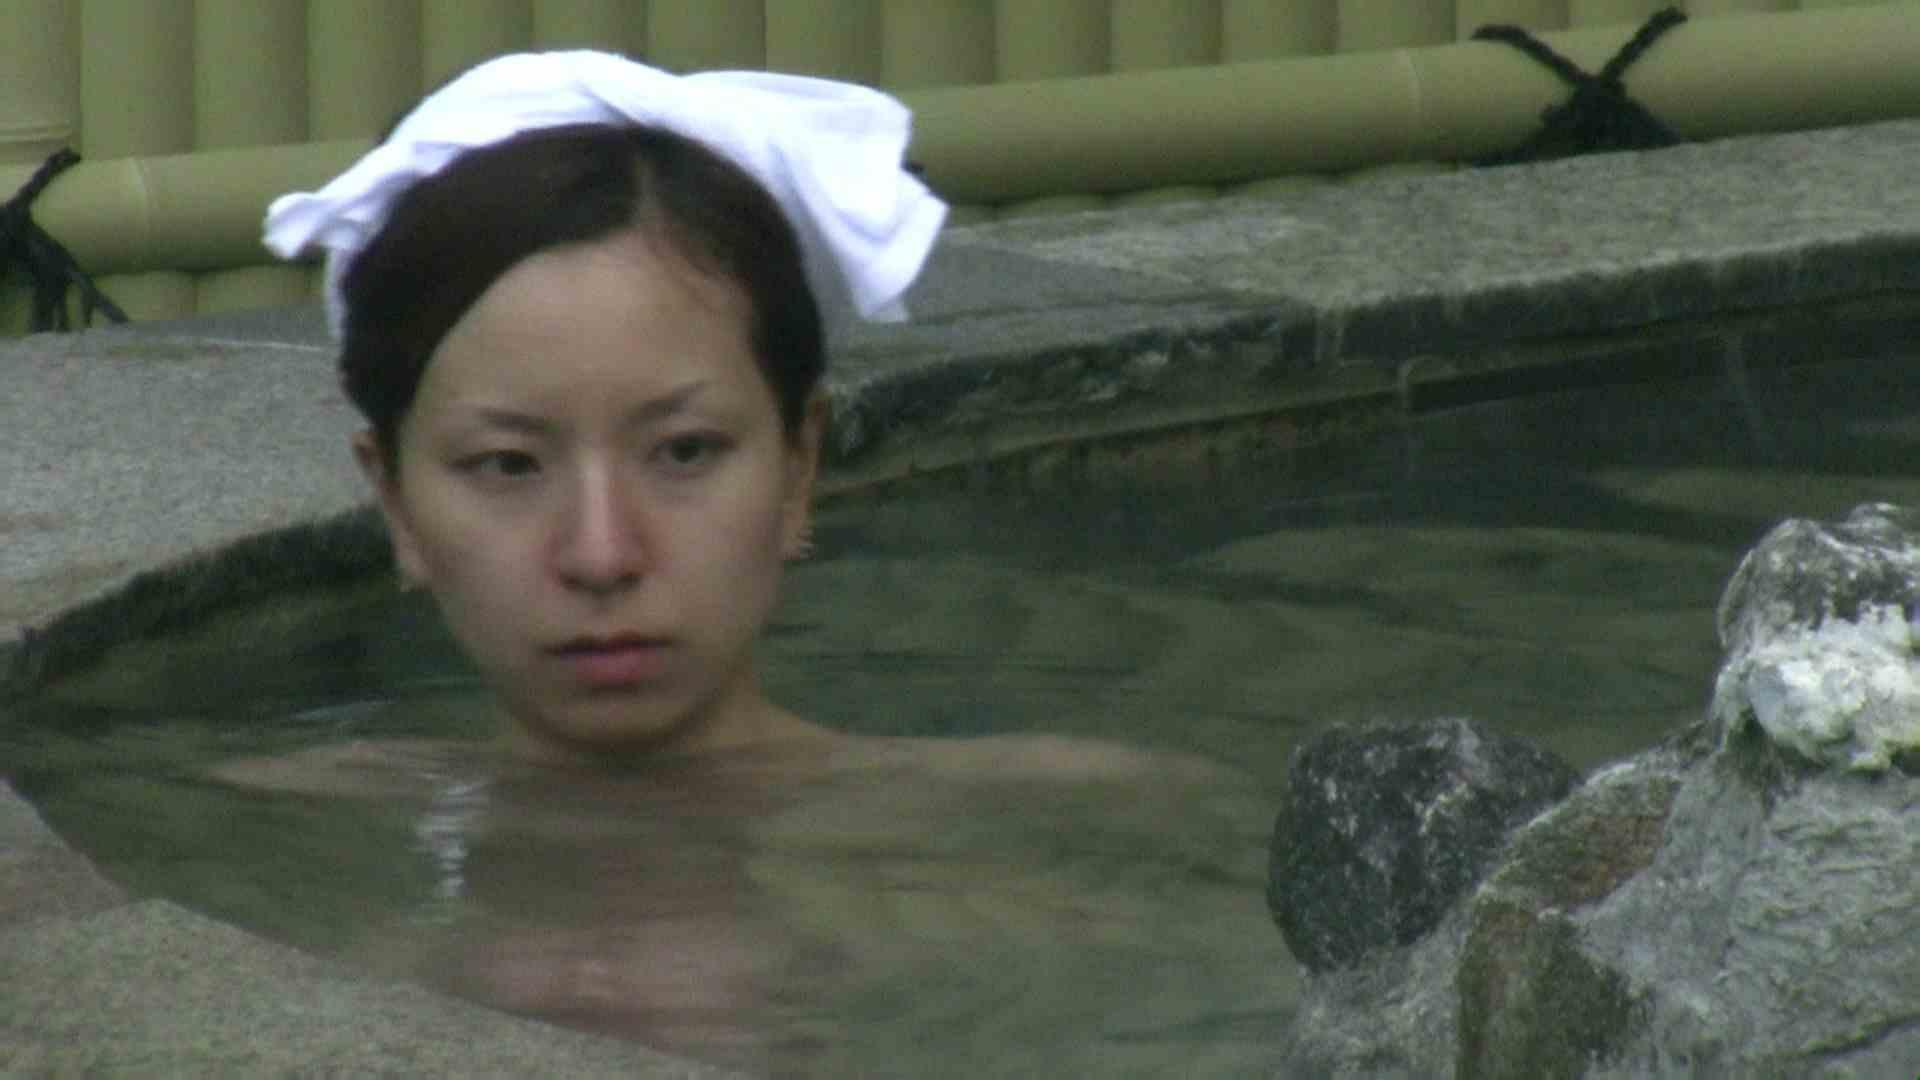 Aquaな露天風呂Vol.39【VIP】 盗撮シリーズ   露天風呂編  85PIX 33